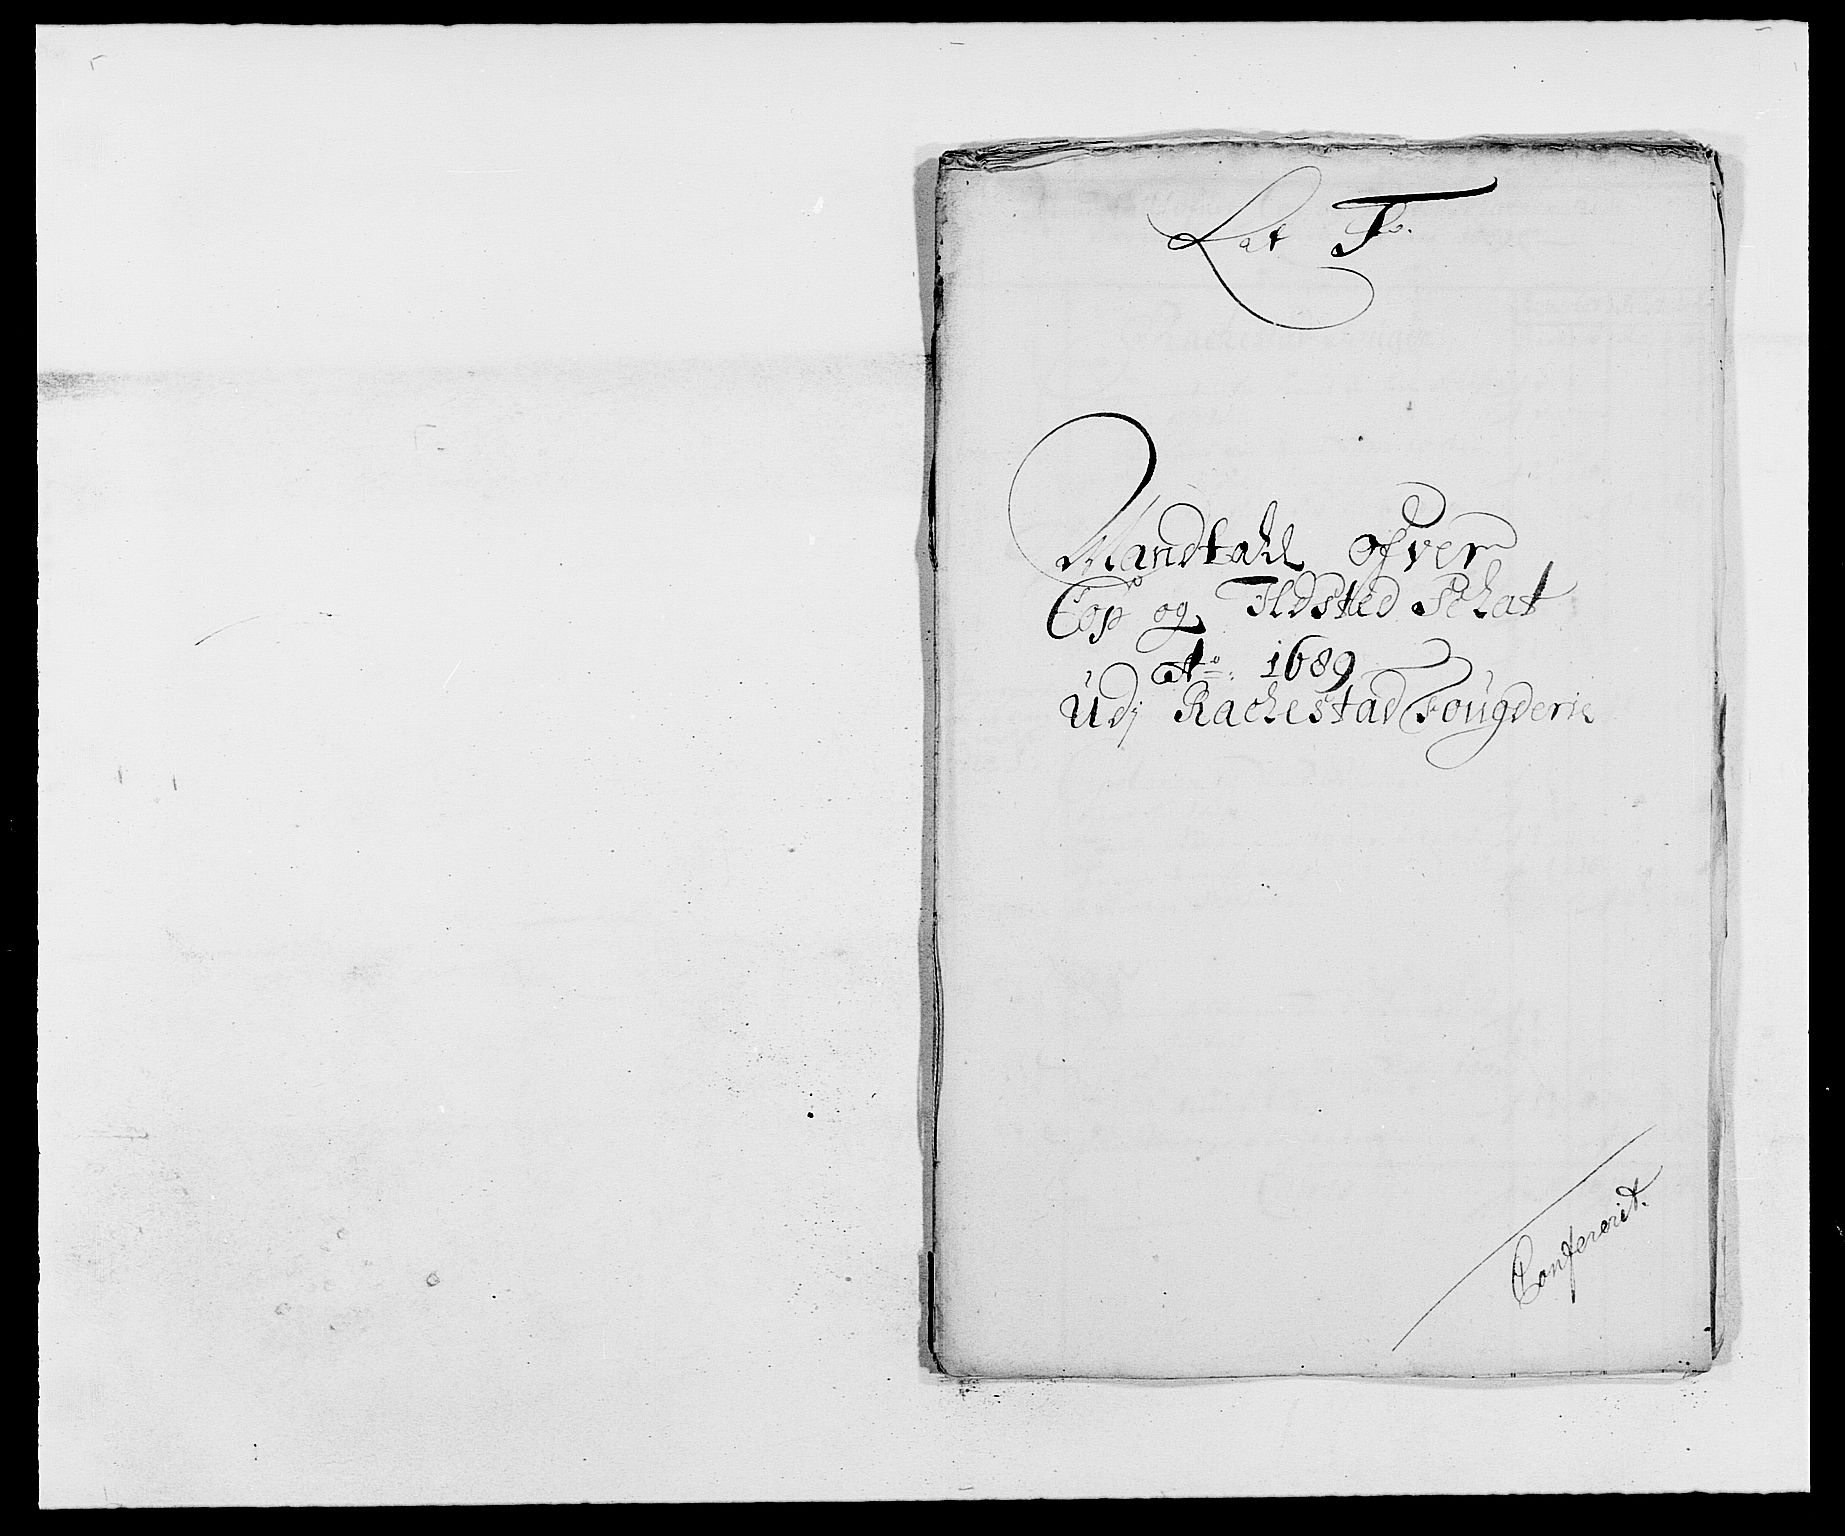 RA, Rentekammeret inntil 1814, Reviderte regnskaper, Fogderegnskap, R05/L0277: Fogderegnskap Rakkestad, 1689-1690, s. 137